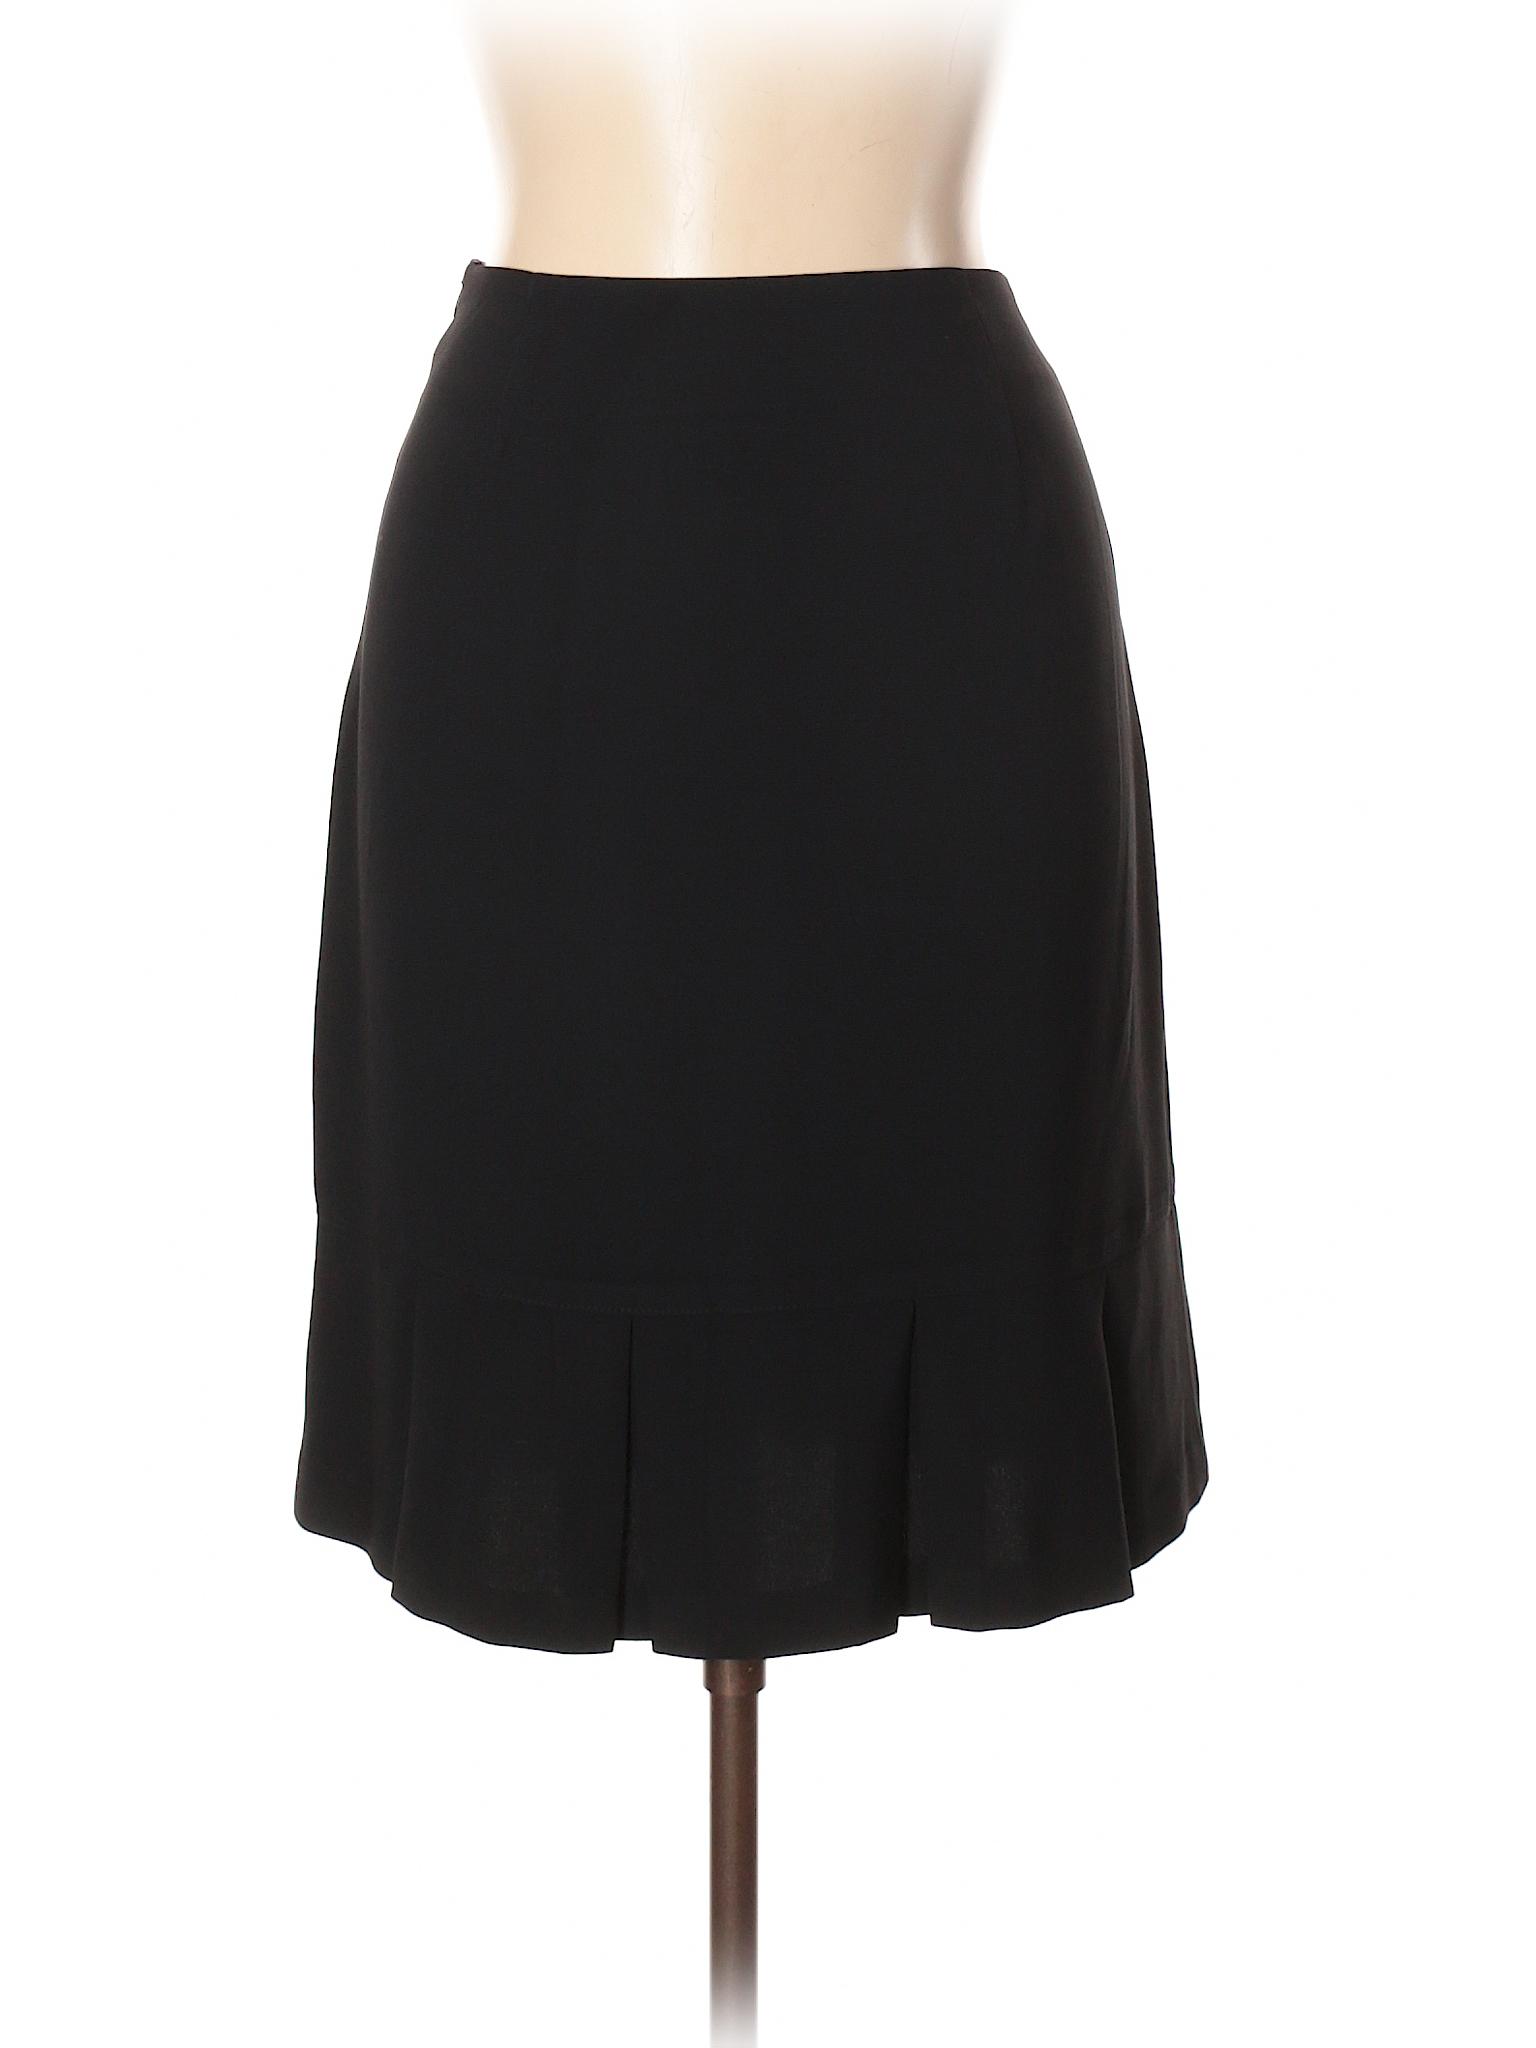 Boutique Casual Skirt Boutique Casual Skirt pd4xIrqd